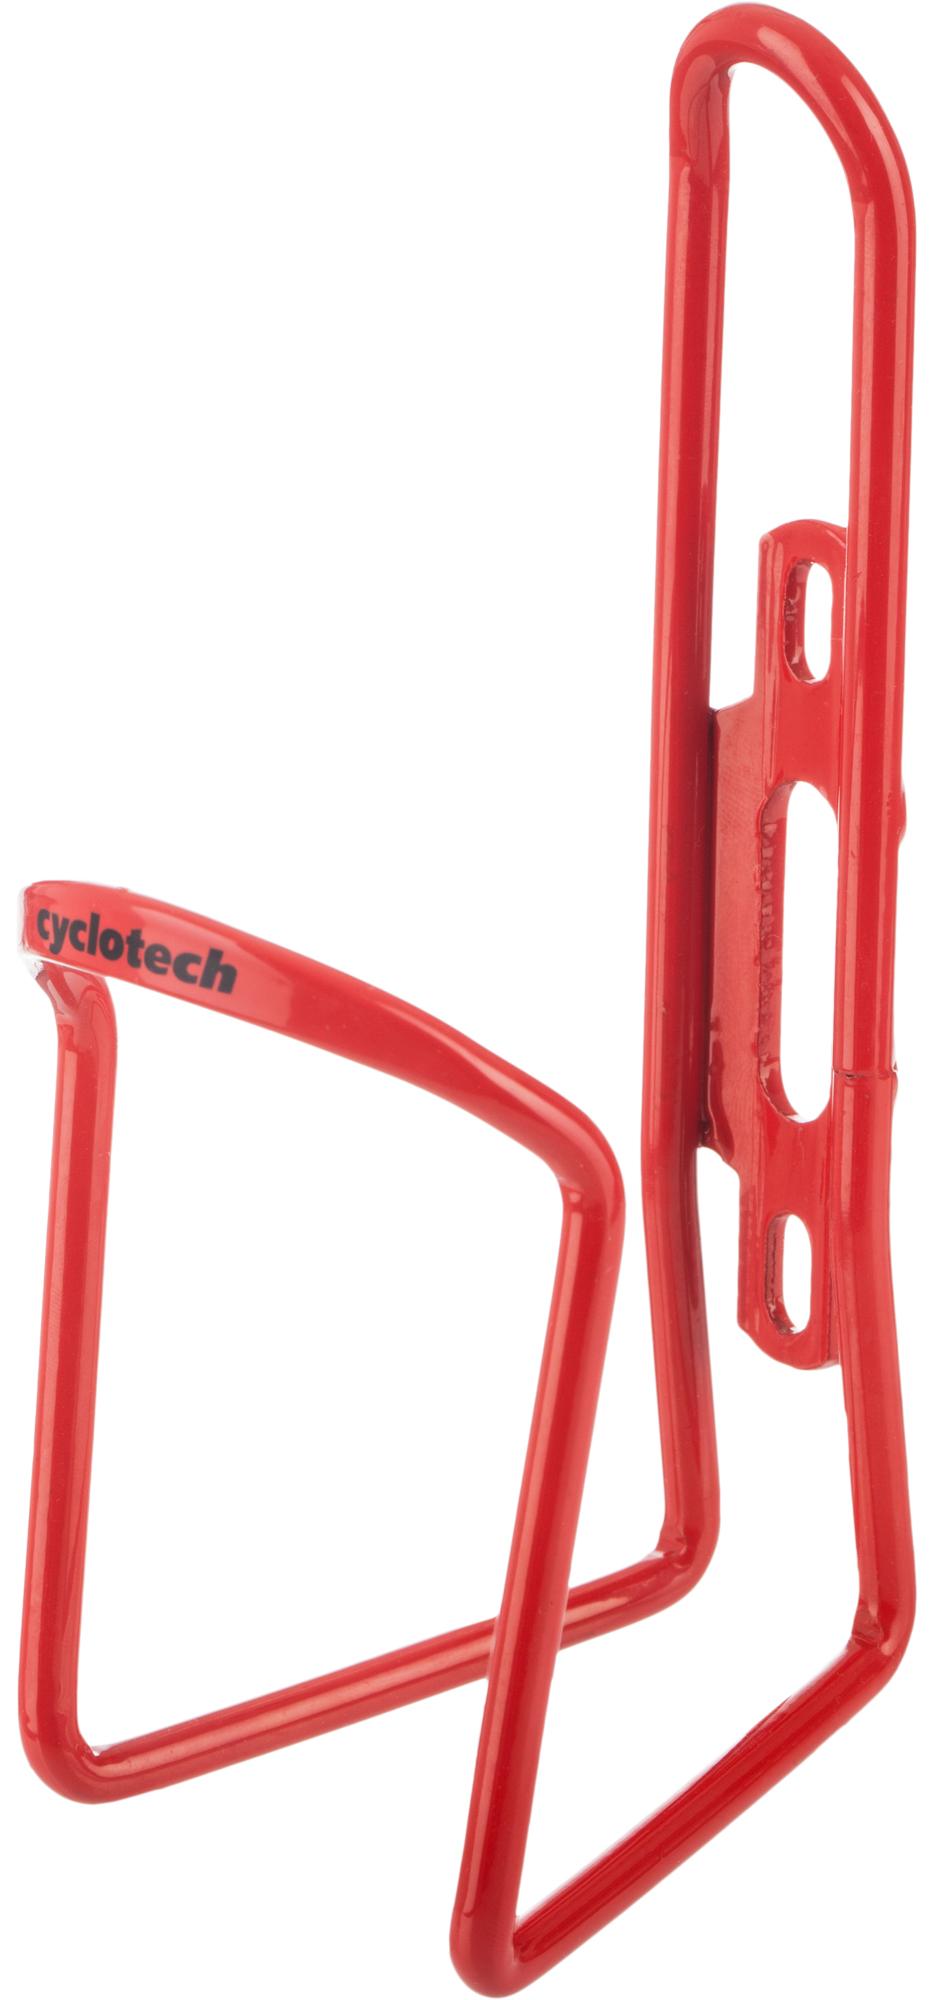 Cyclotech Флягодержатель Cyclotech машинка для чистки цепи cyclotech cyclotech